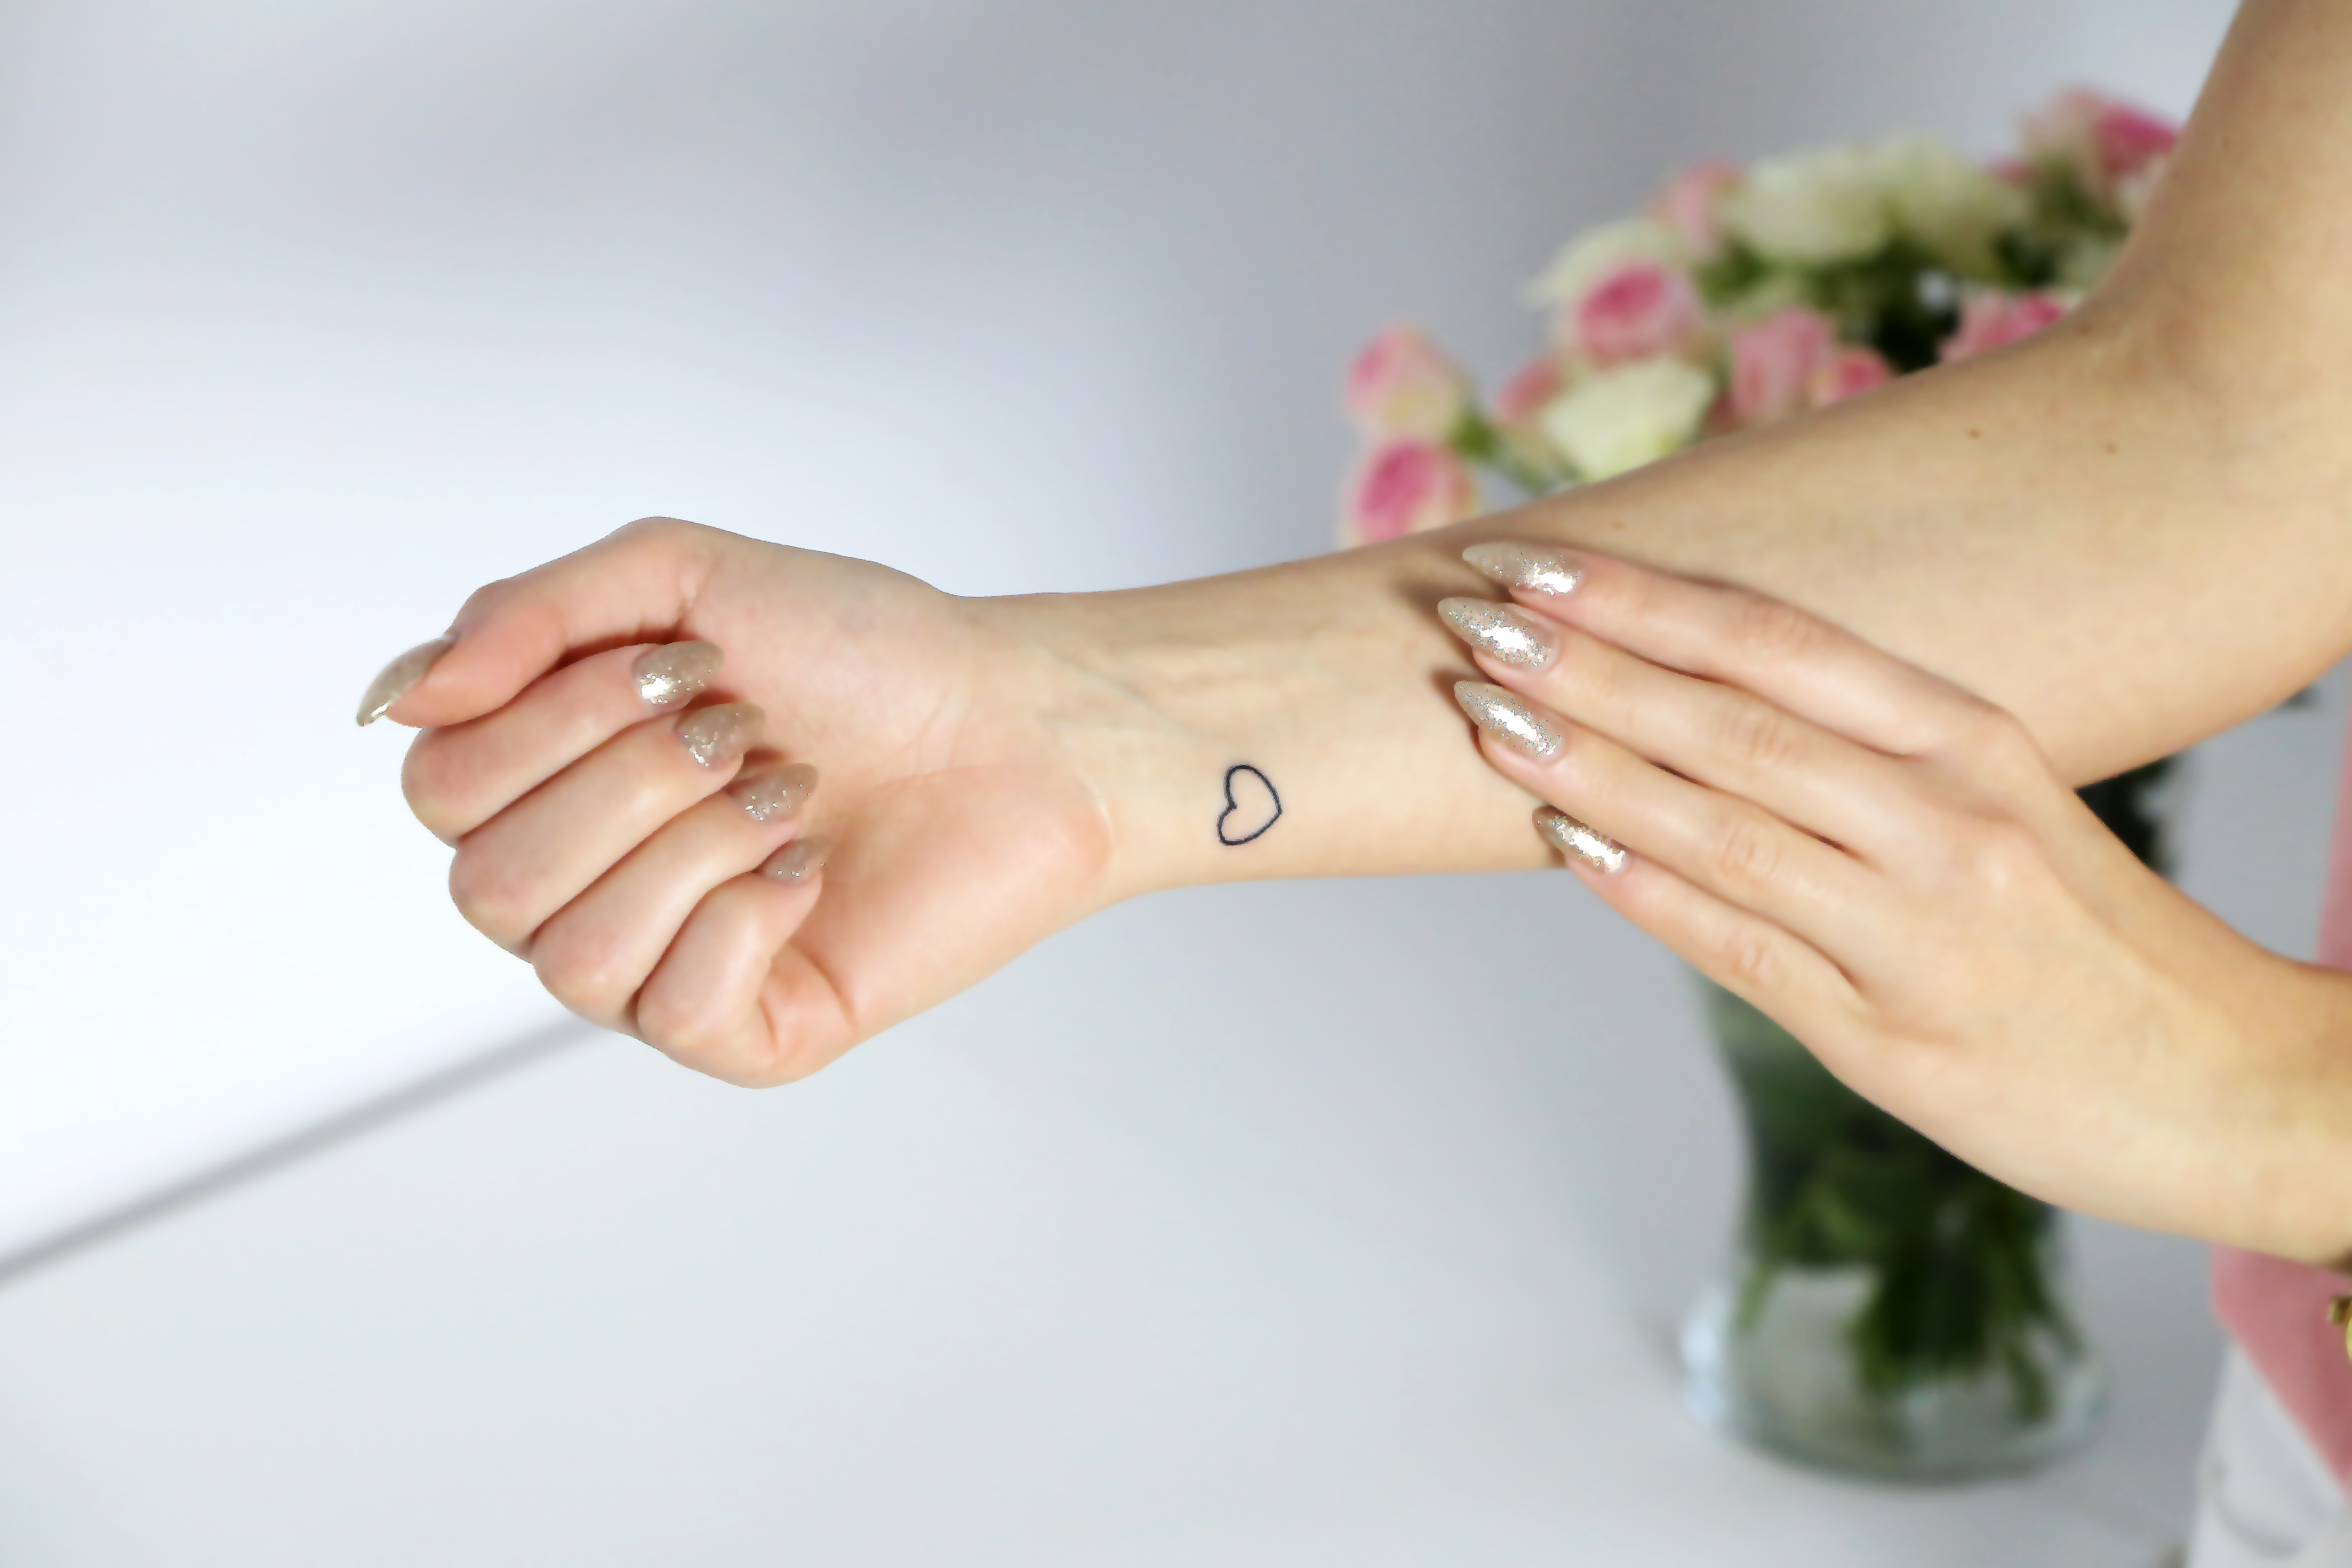 Dwa Nowe Tatuaże Plaamkaa Joanna Kieryk